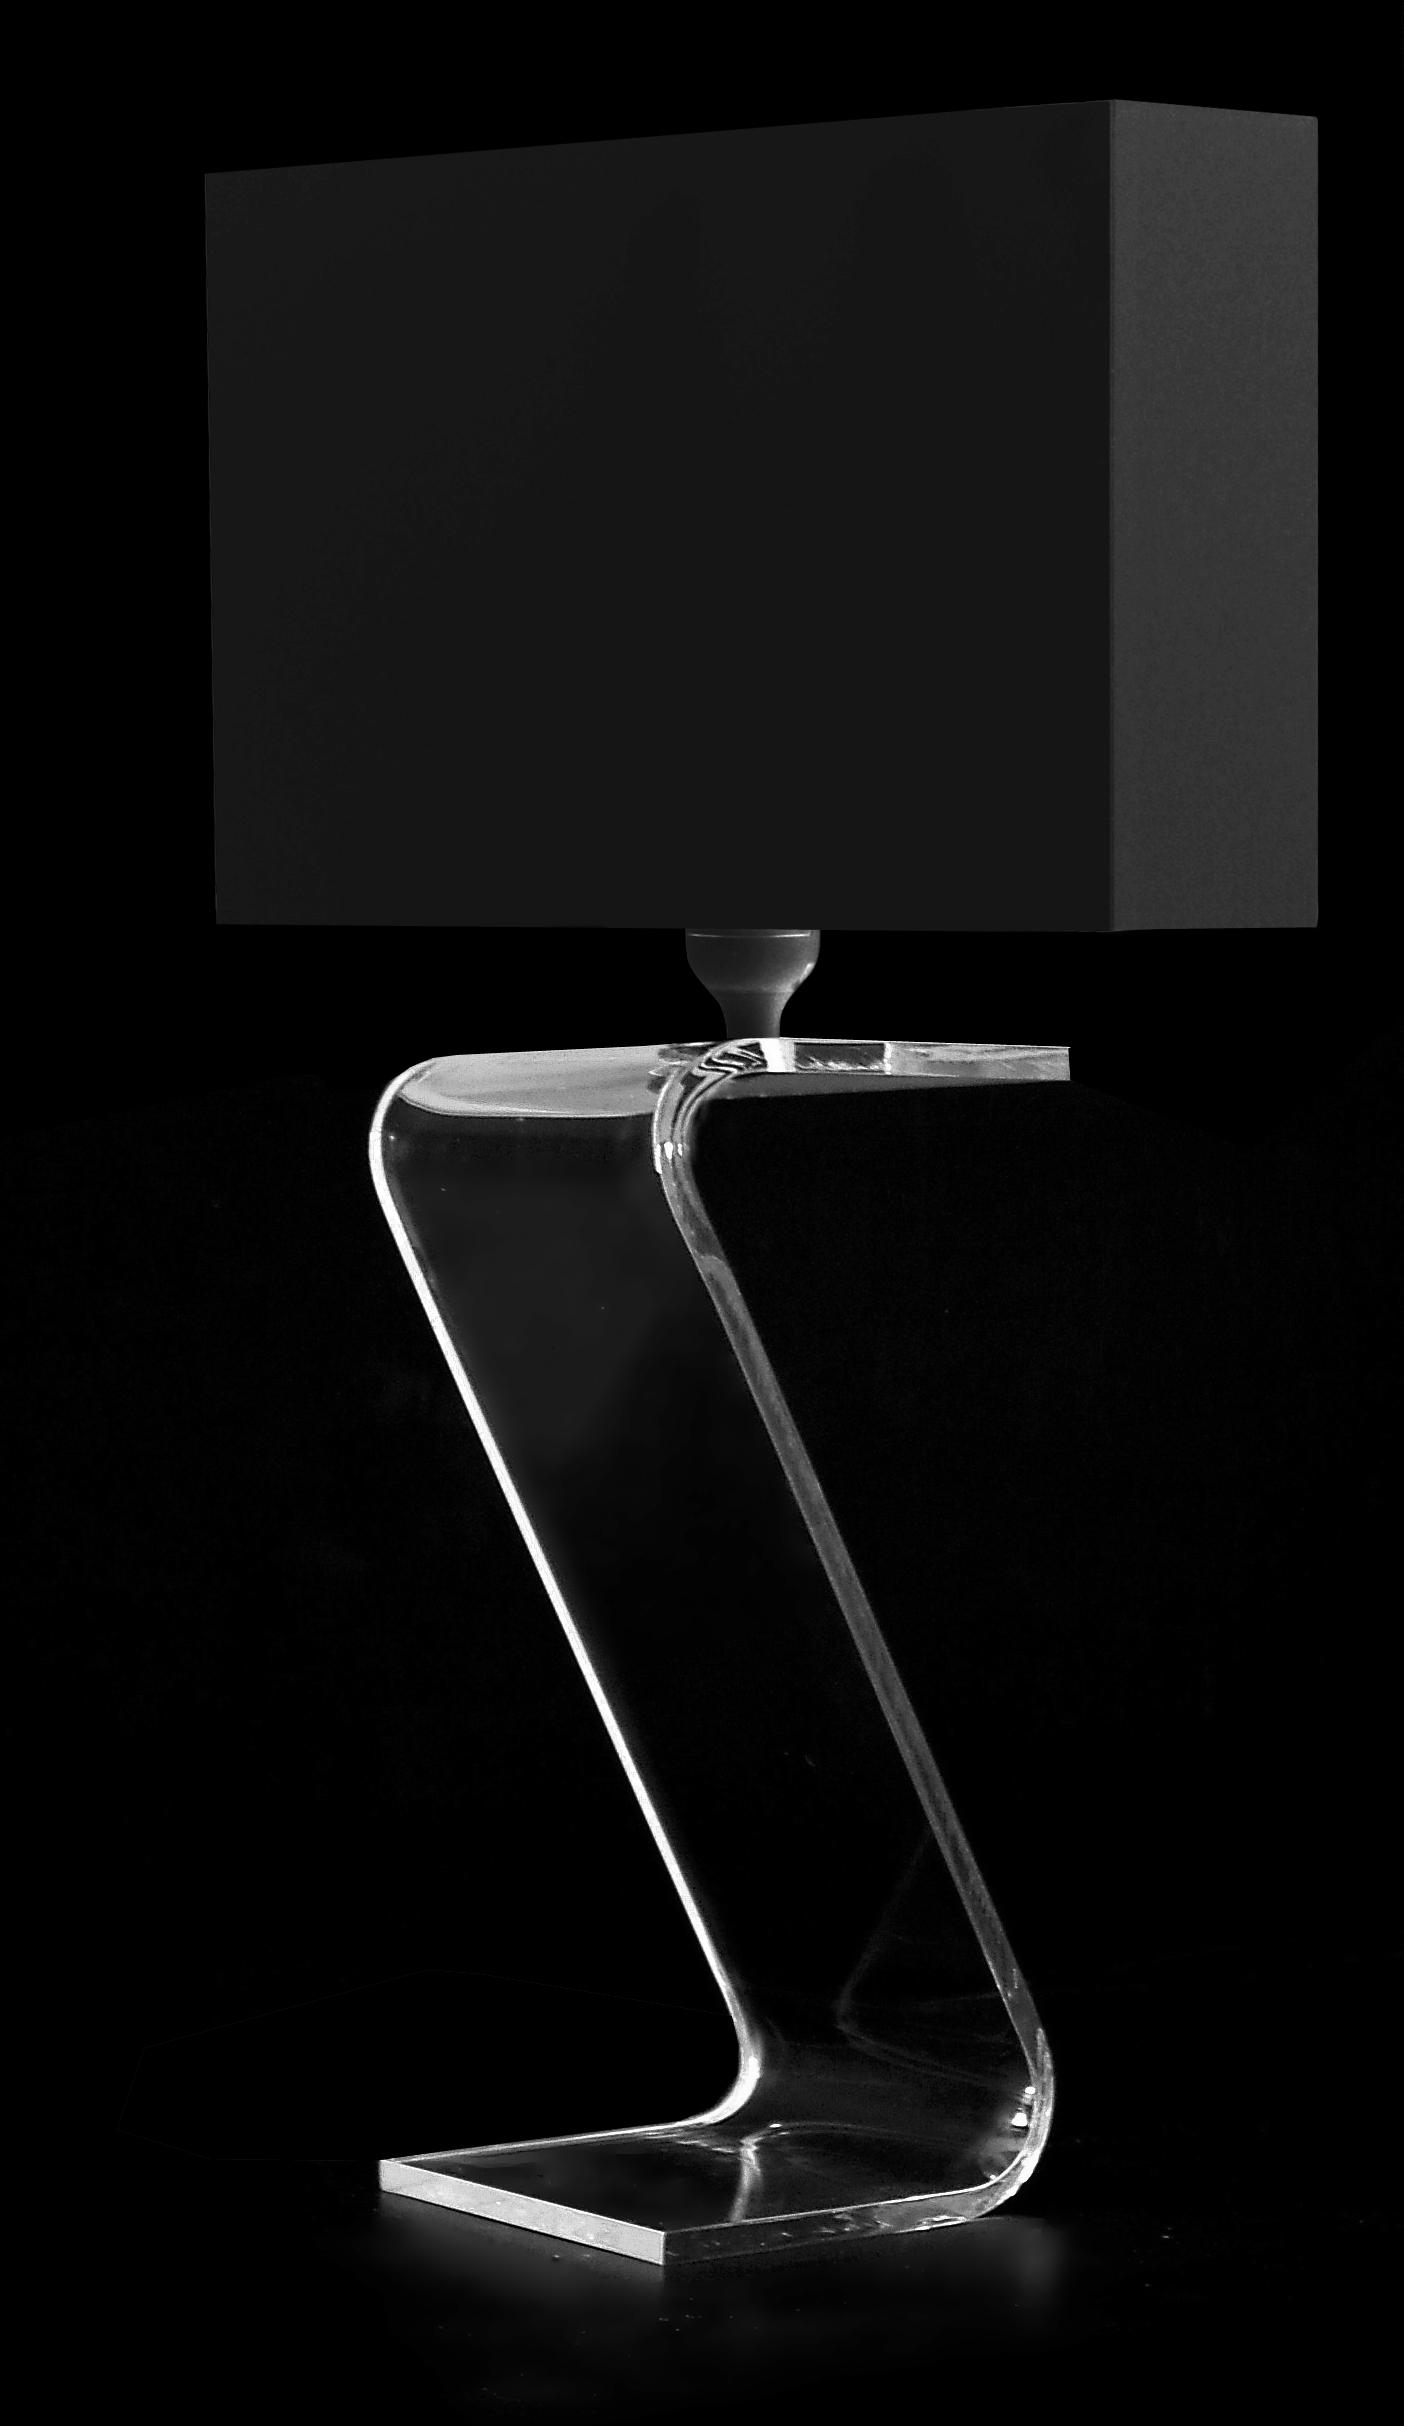 lampeZ transparente abjour noir.jpg